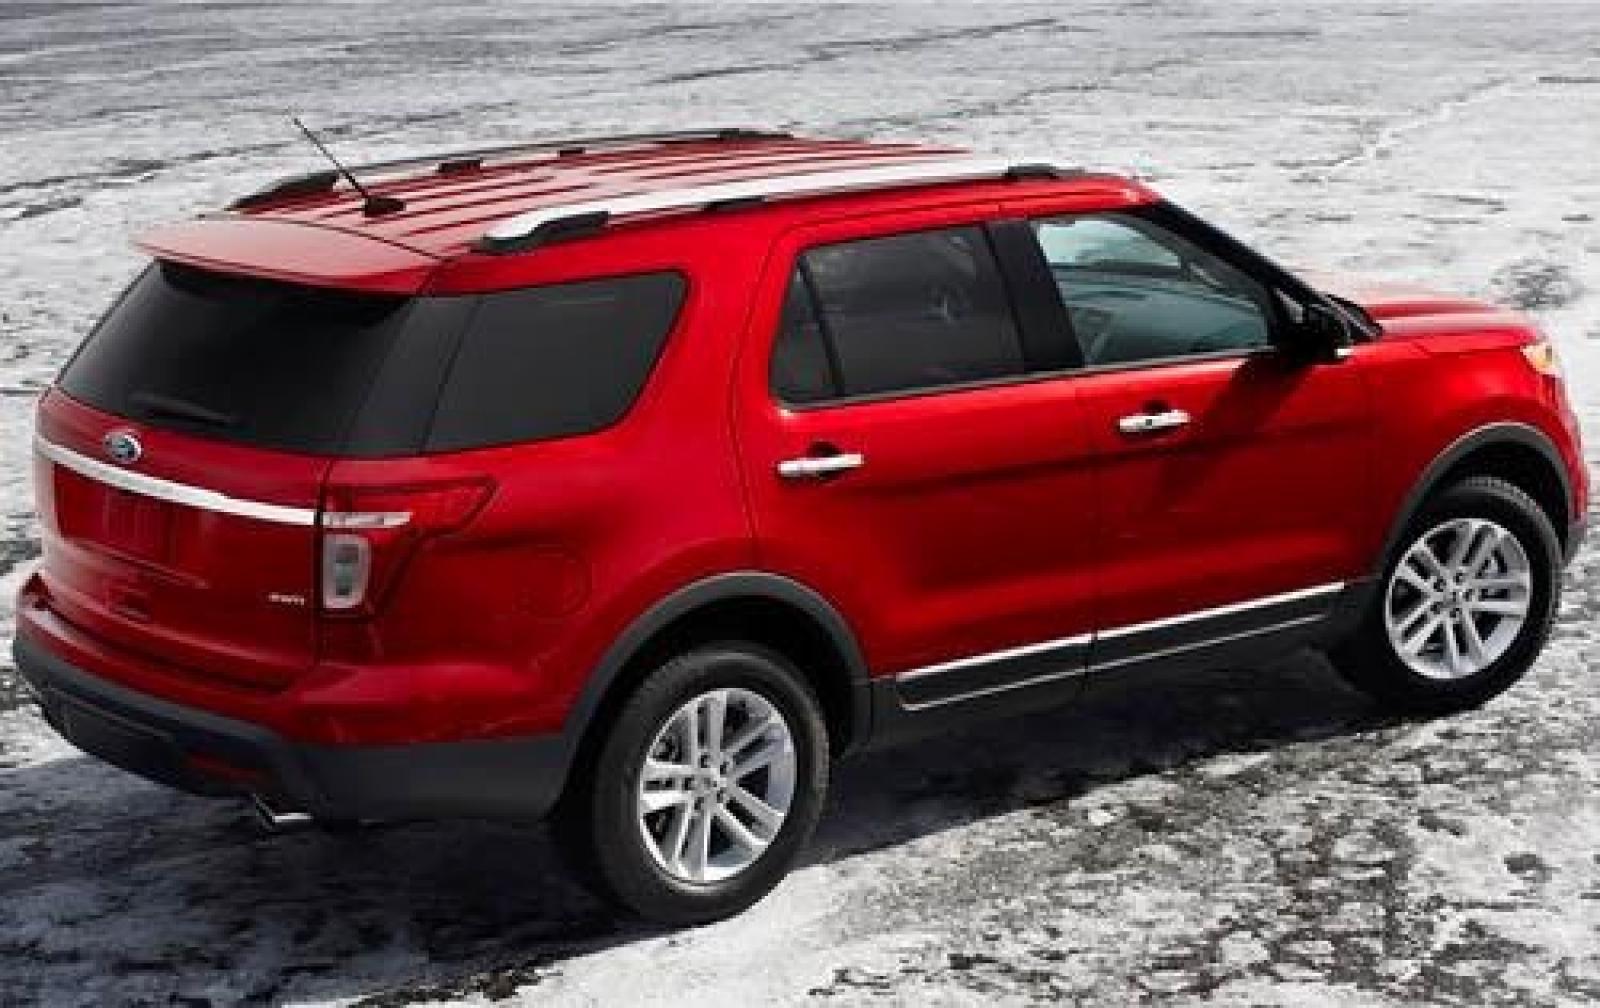 800 1024 1280 1600 origin 2012 ford explorer